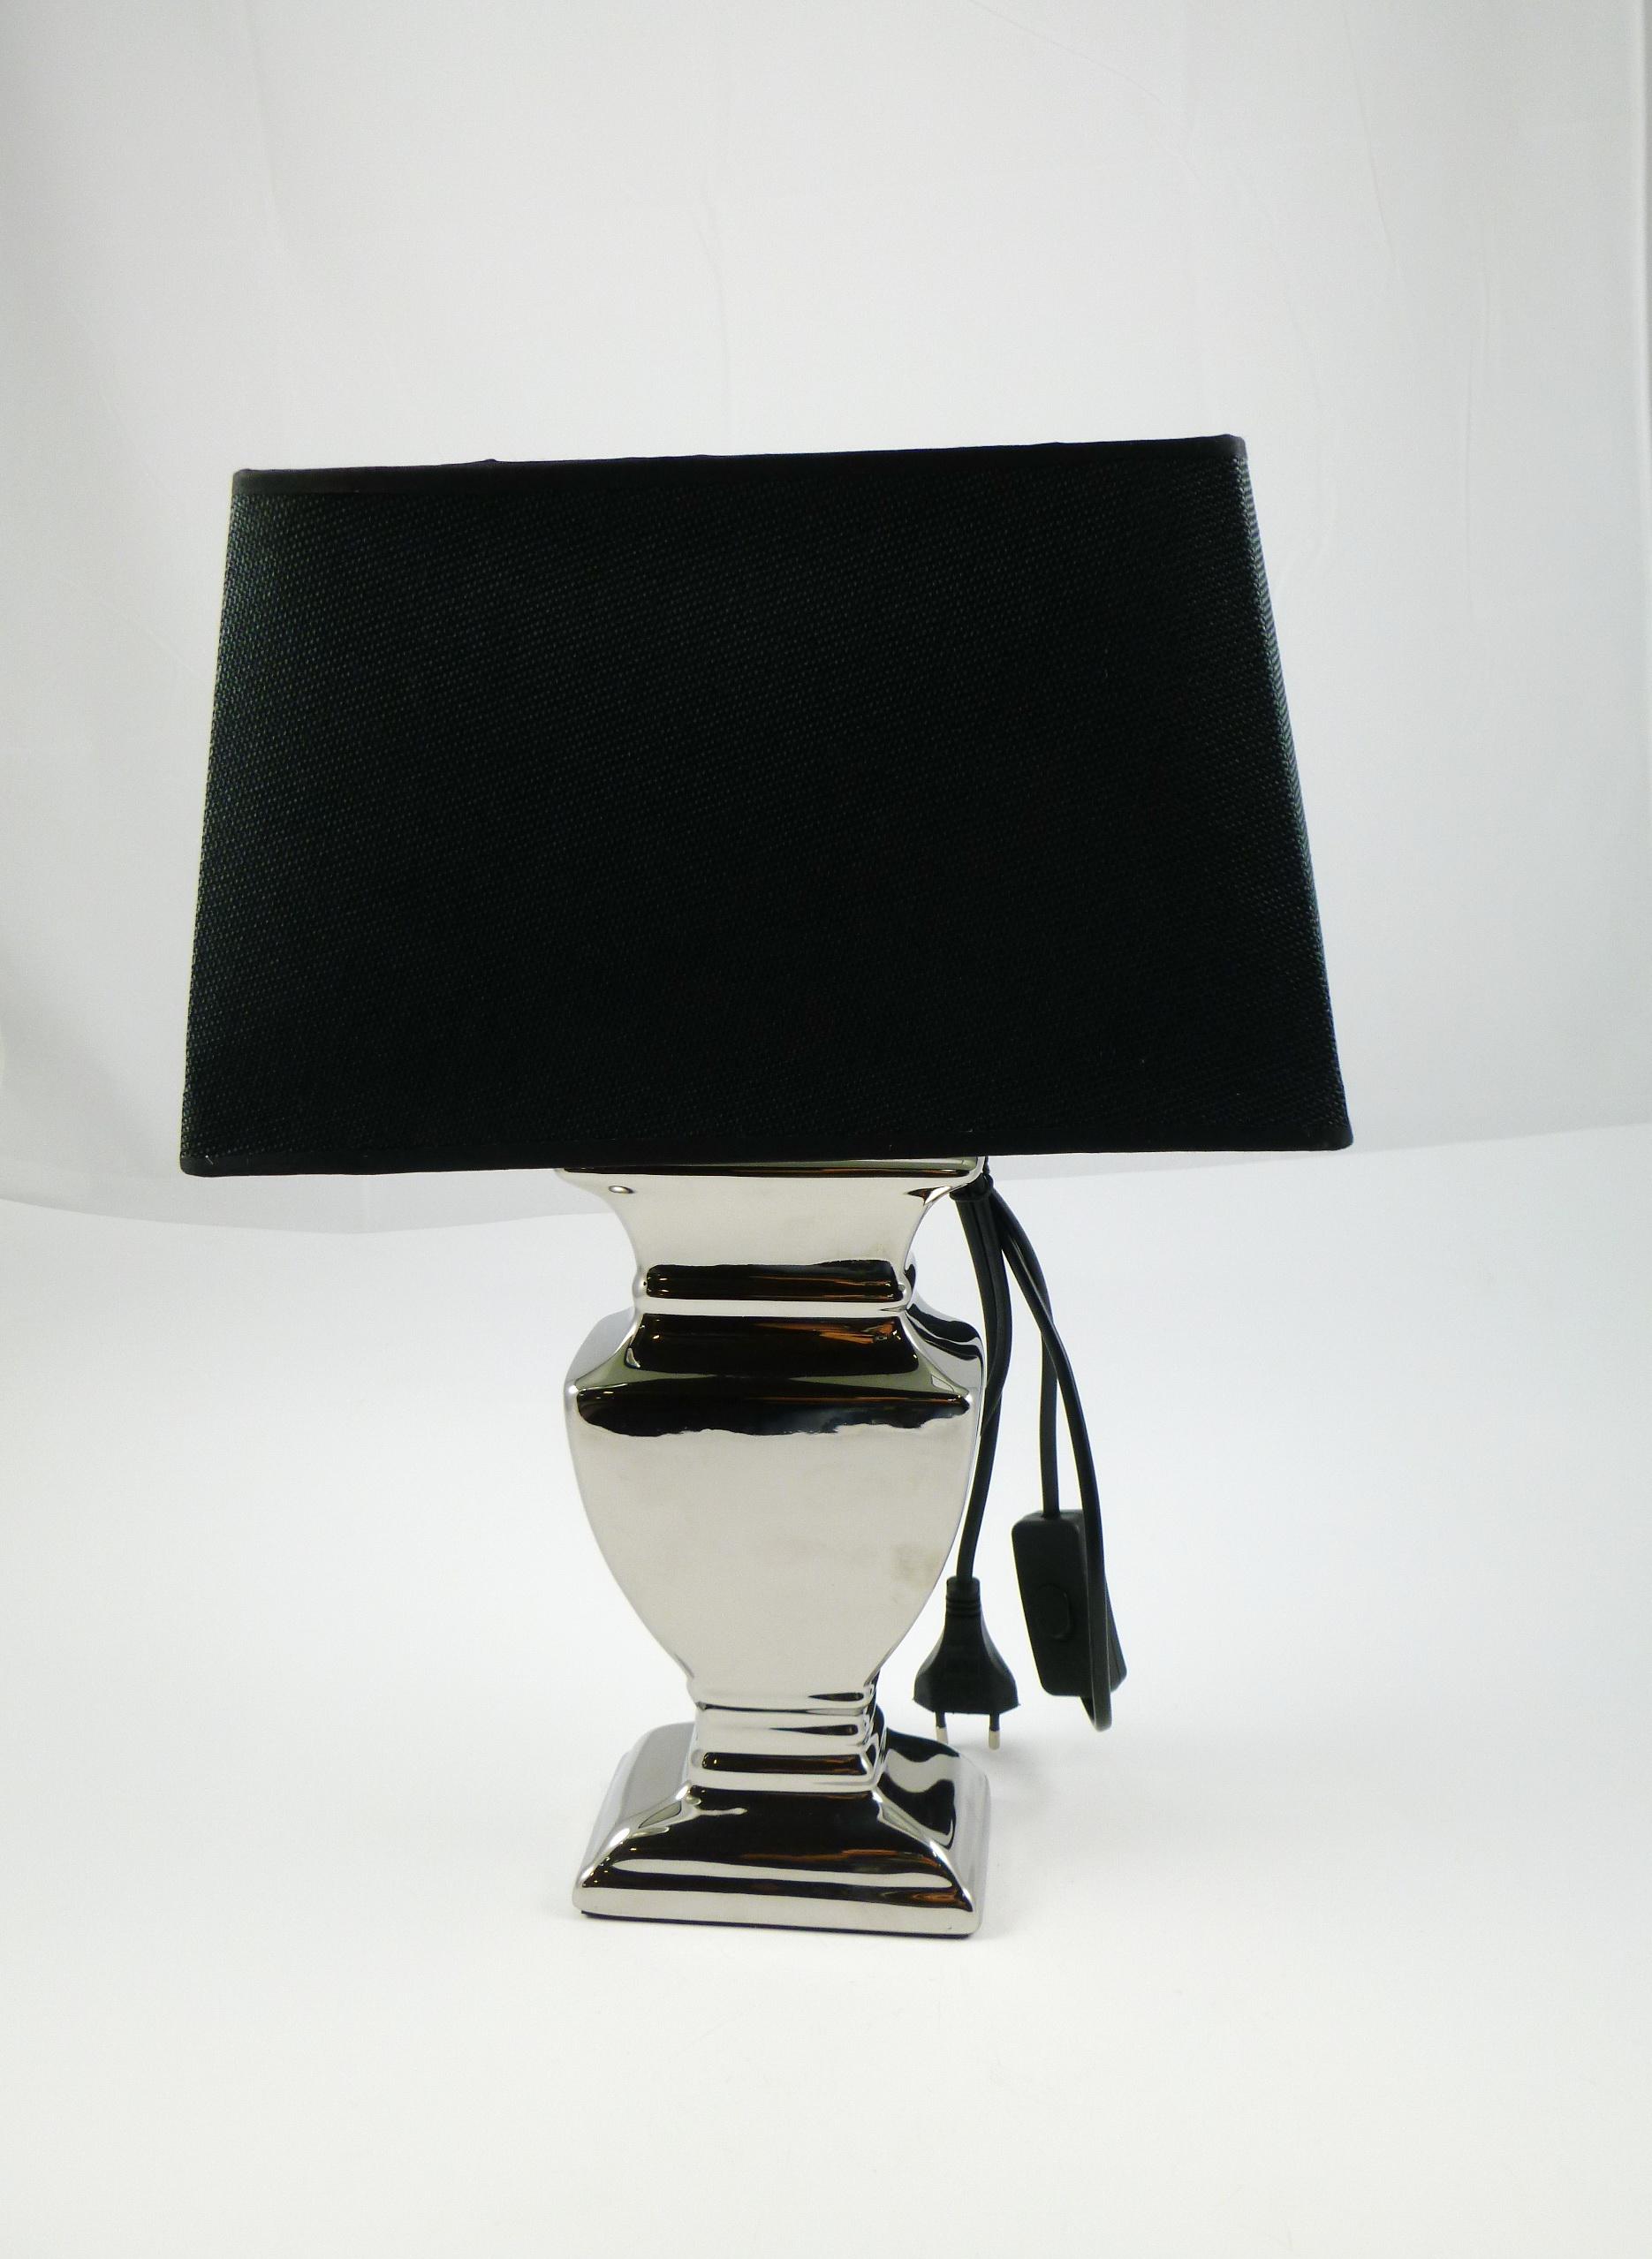 Lampe Malta eckig 12,5x7,5x31cm, 1 Stück